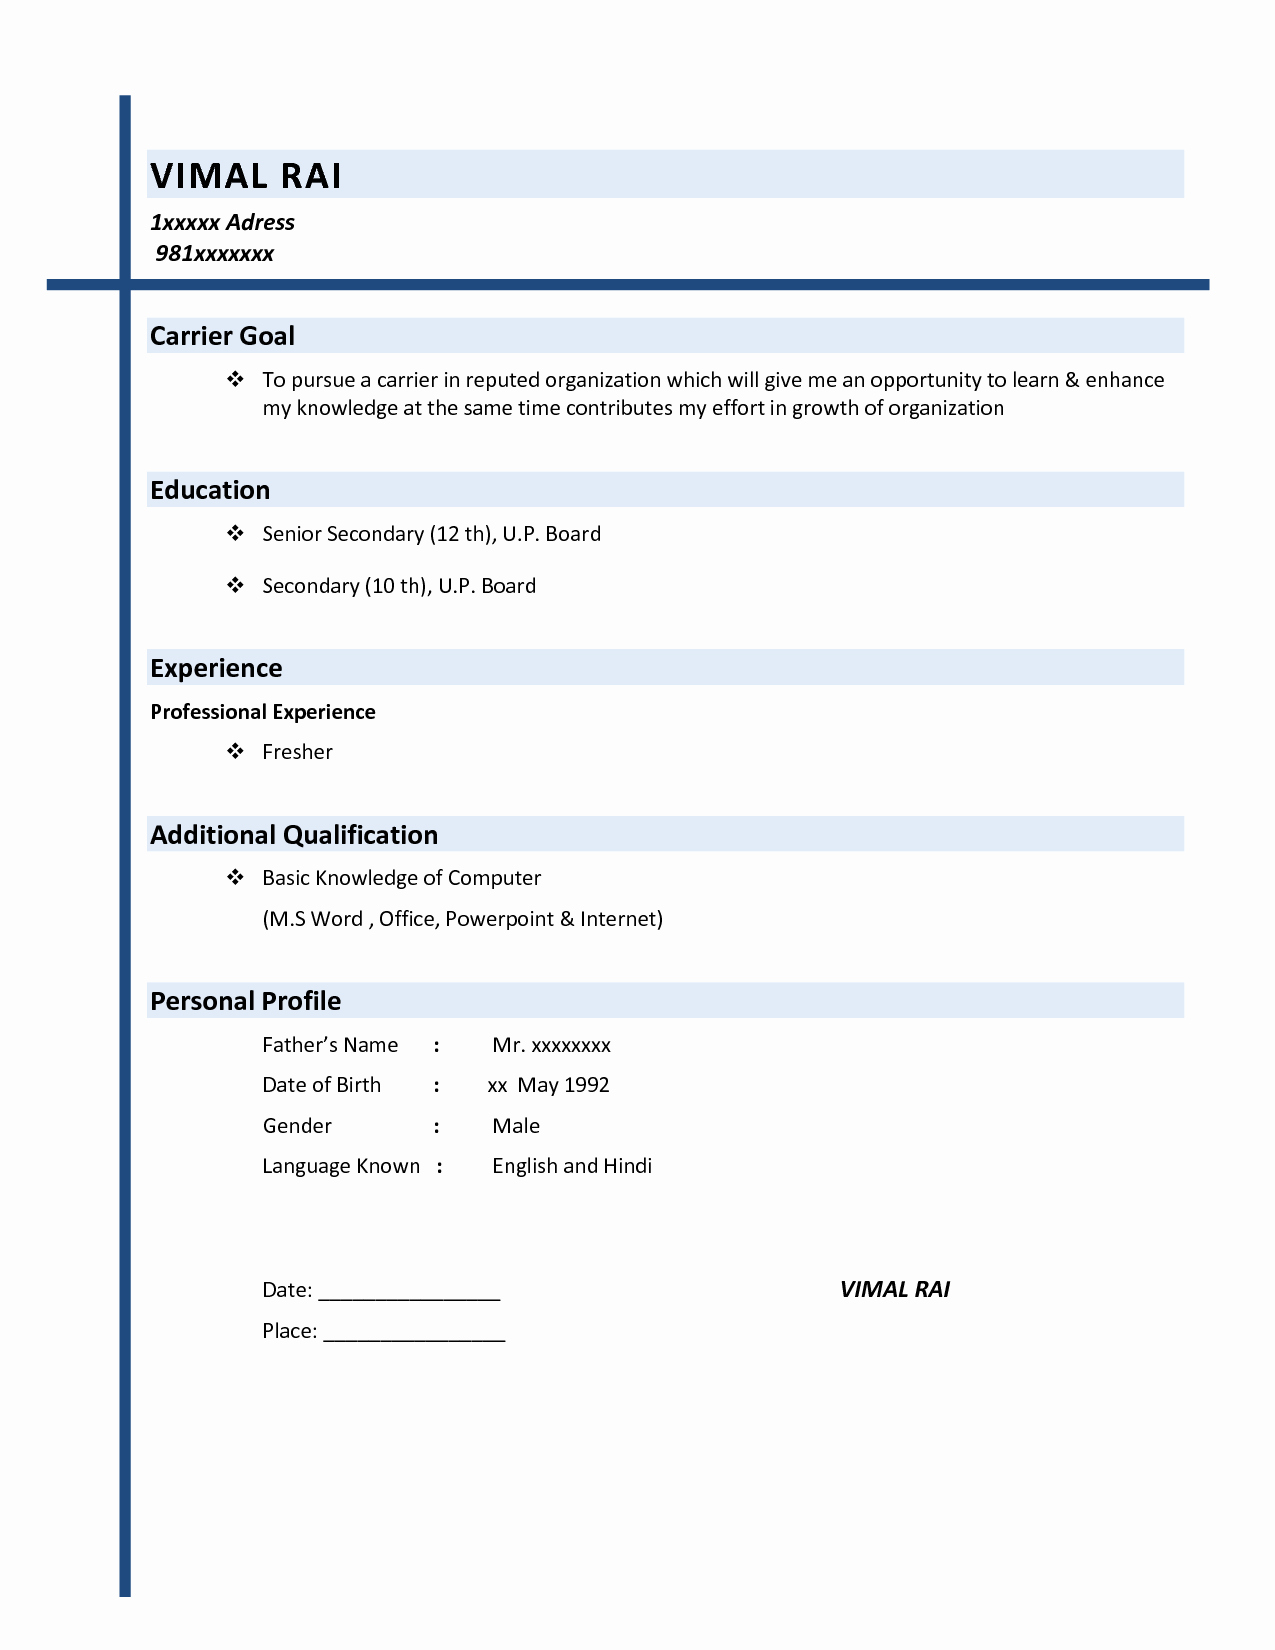 Samples Of A Basic Resume Luxury Resume Examples Basic Resume Examples Basic Resume